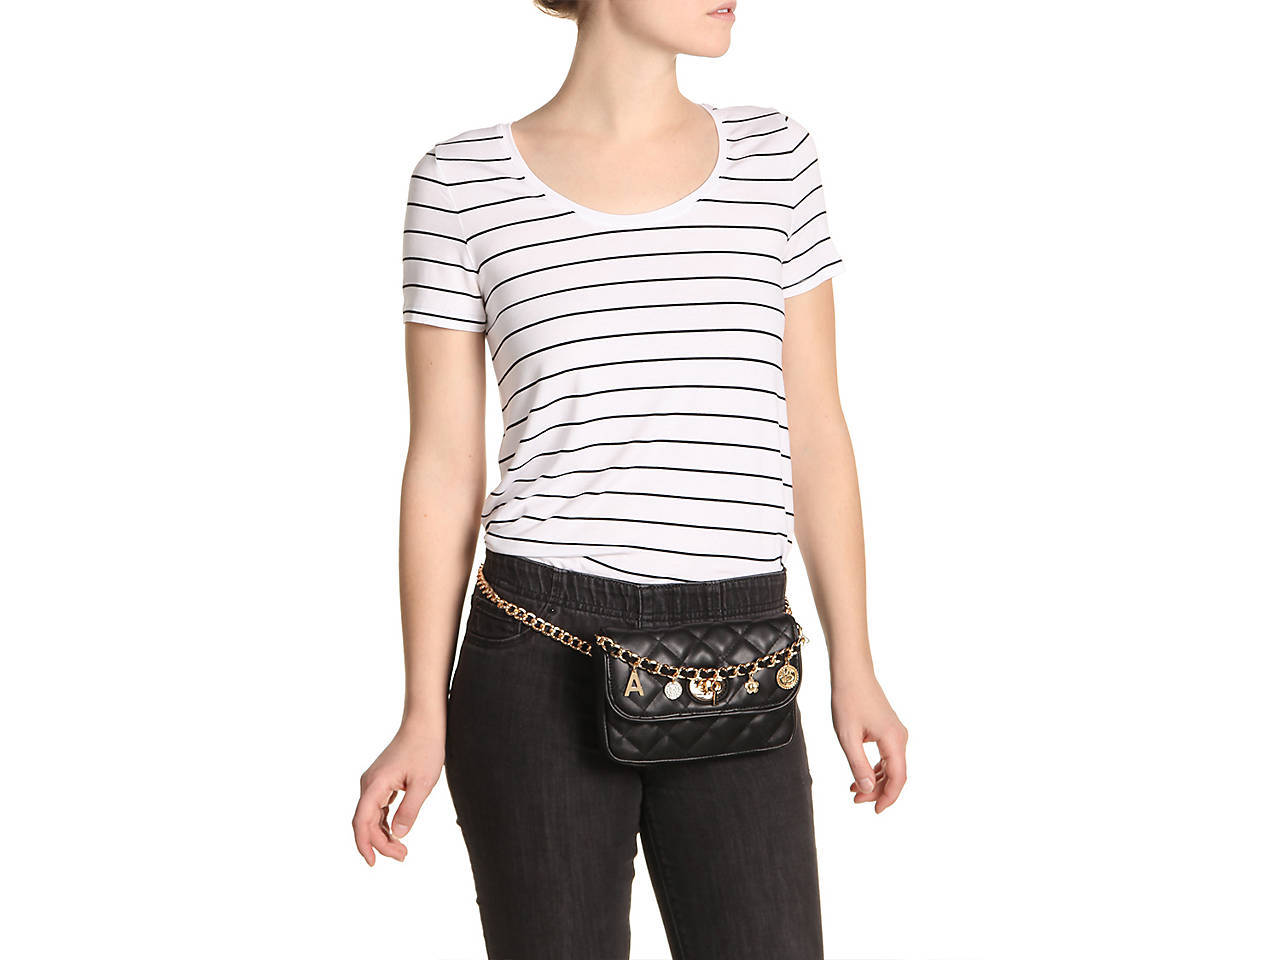 c64826ef8bb Aldo Agrama Belt Bag Women s Handbags   Accessories